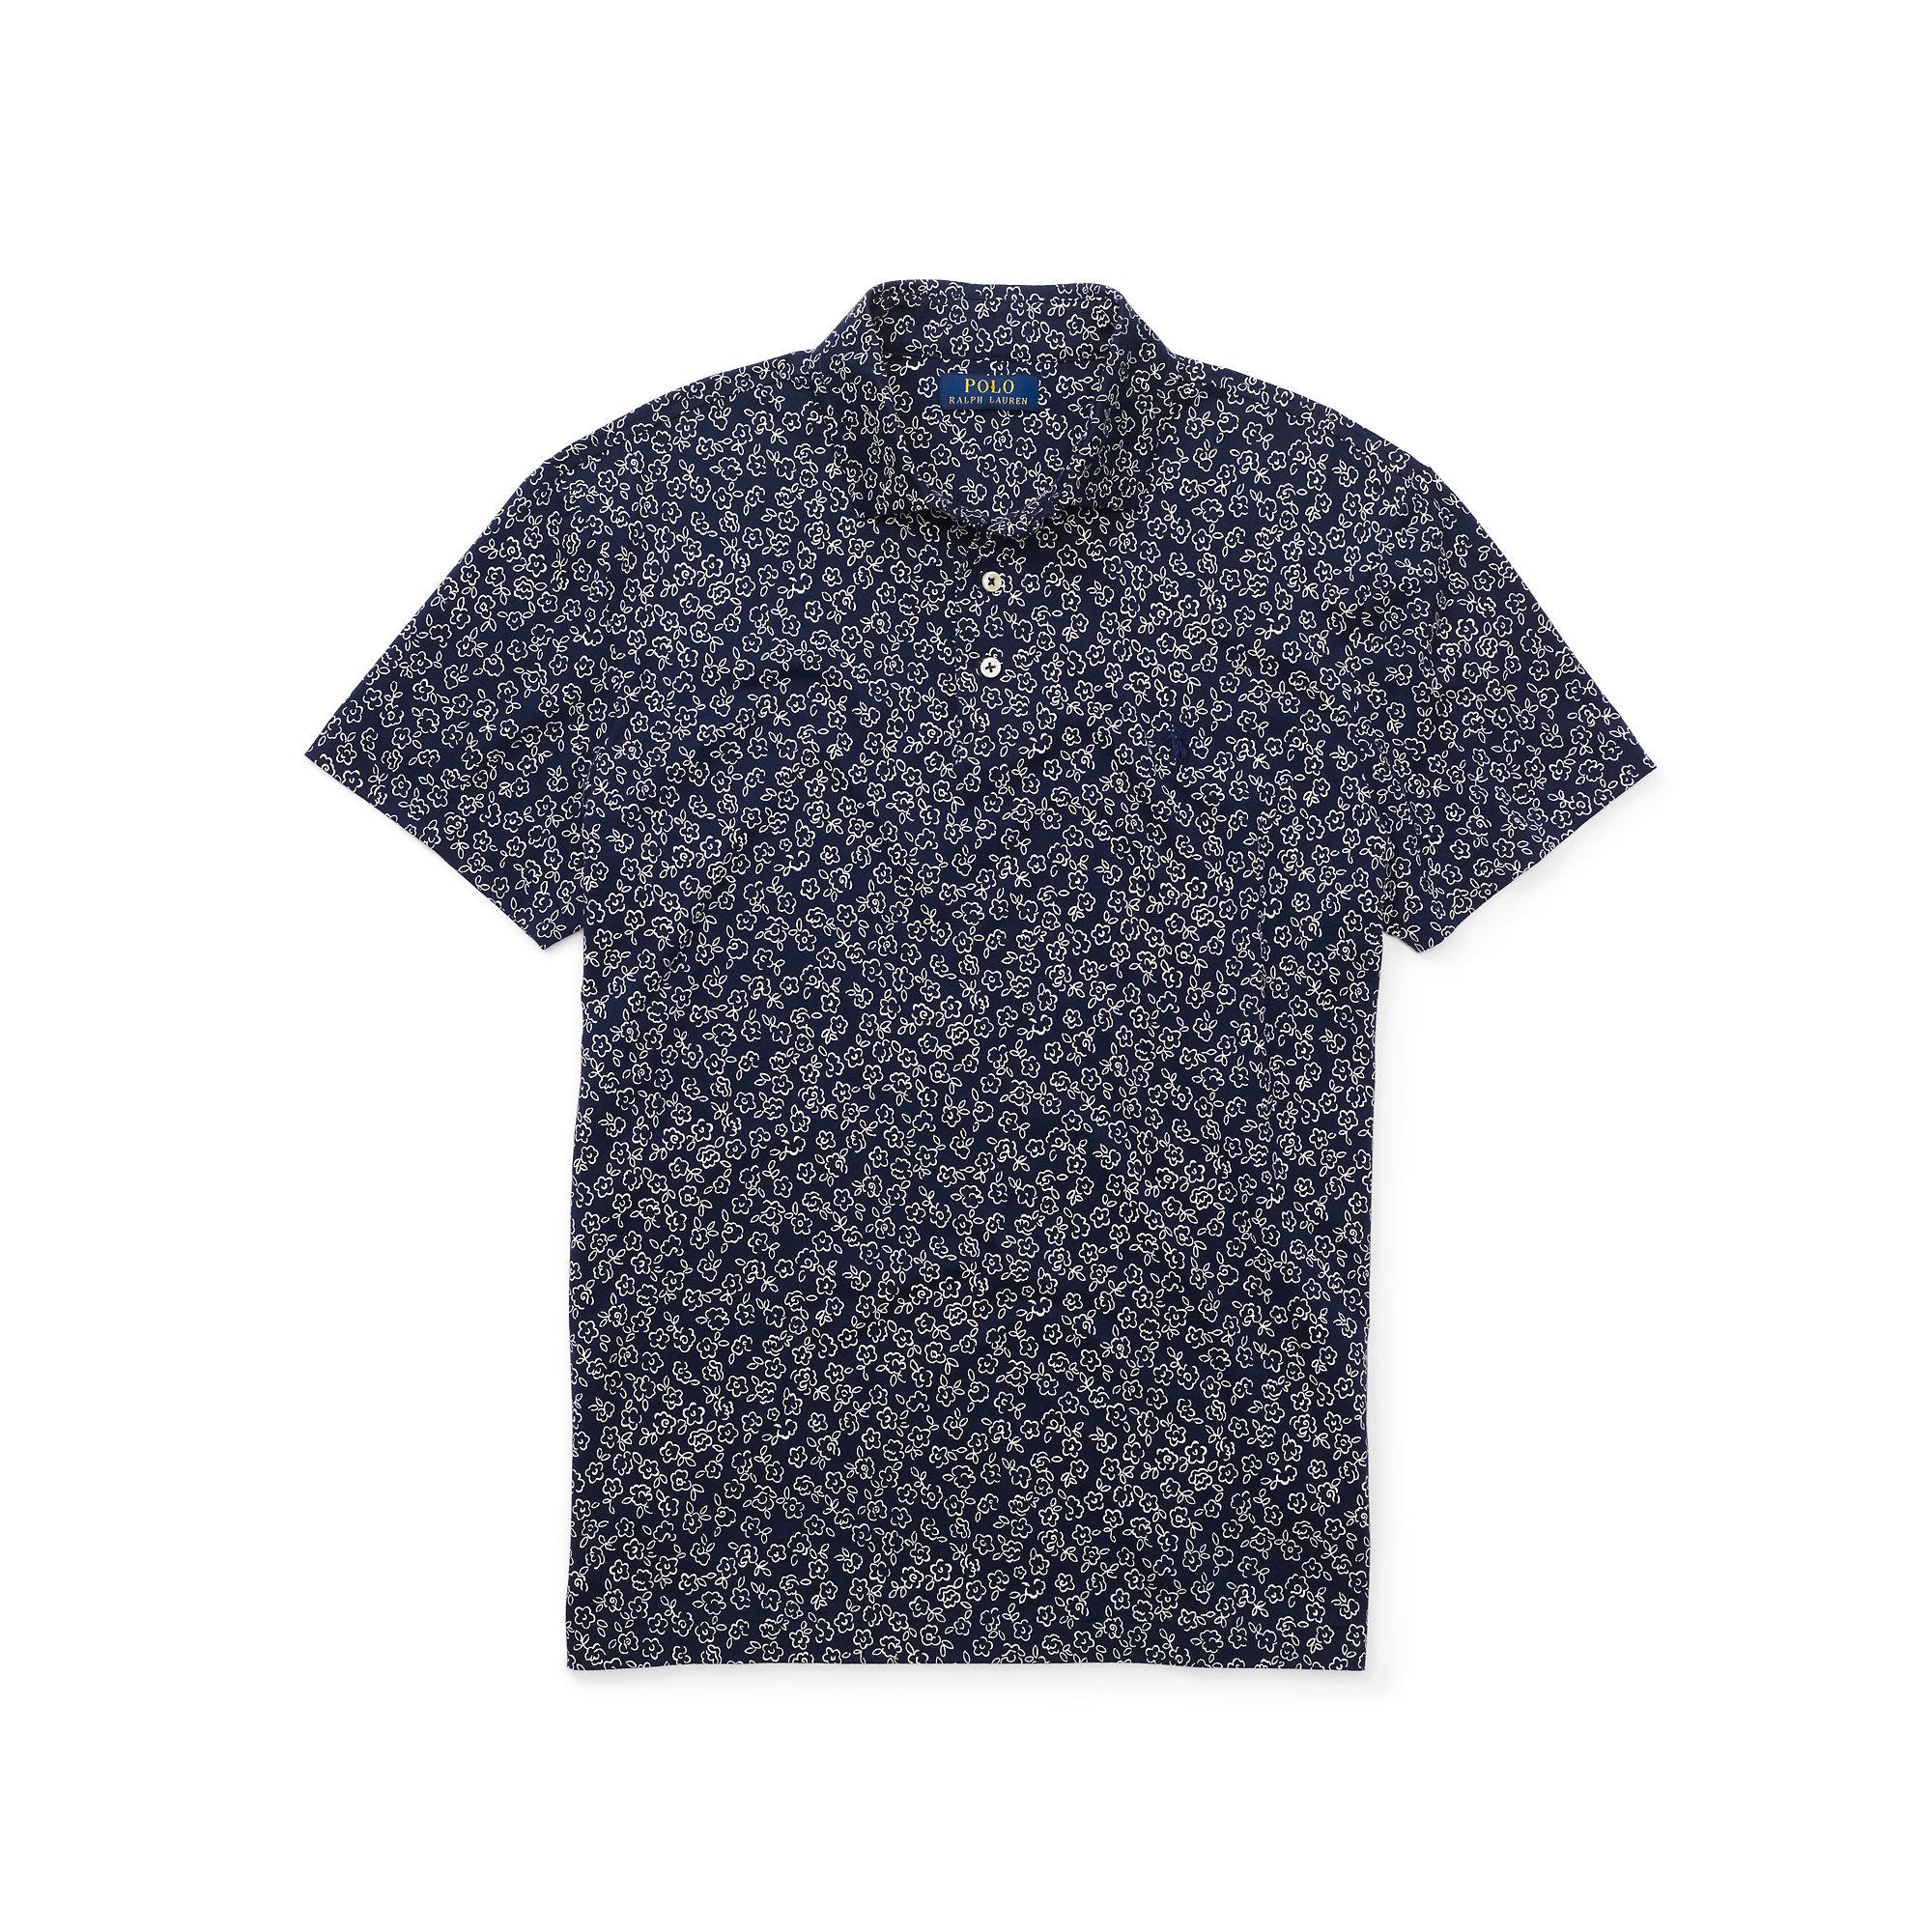 Polo ralph lauren floral print jersey polo shirt for men for Ralph lauren polo jersey shirt